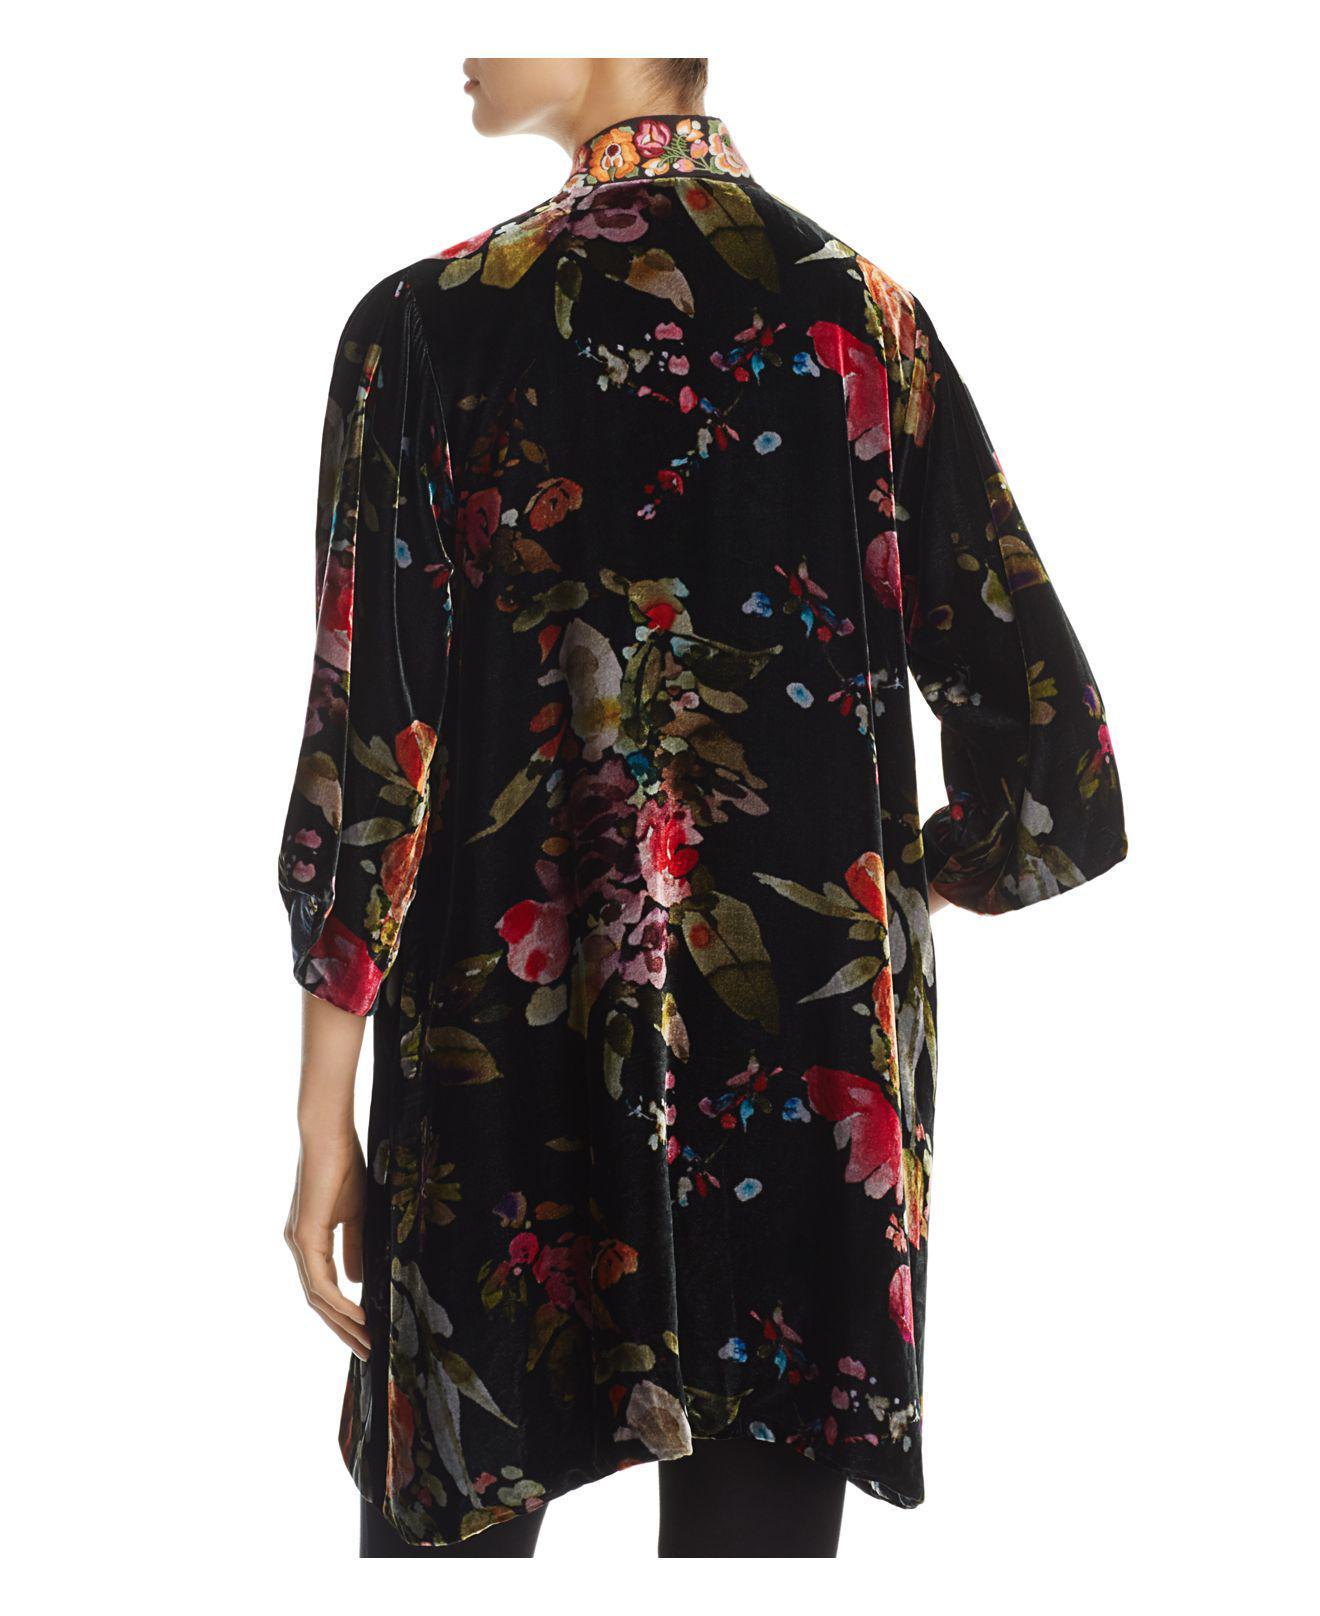 Lyst - Johnny was Kehlani Reversible Kimono Jacket in Black